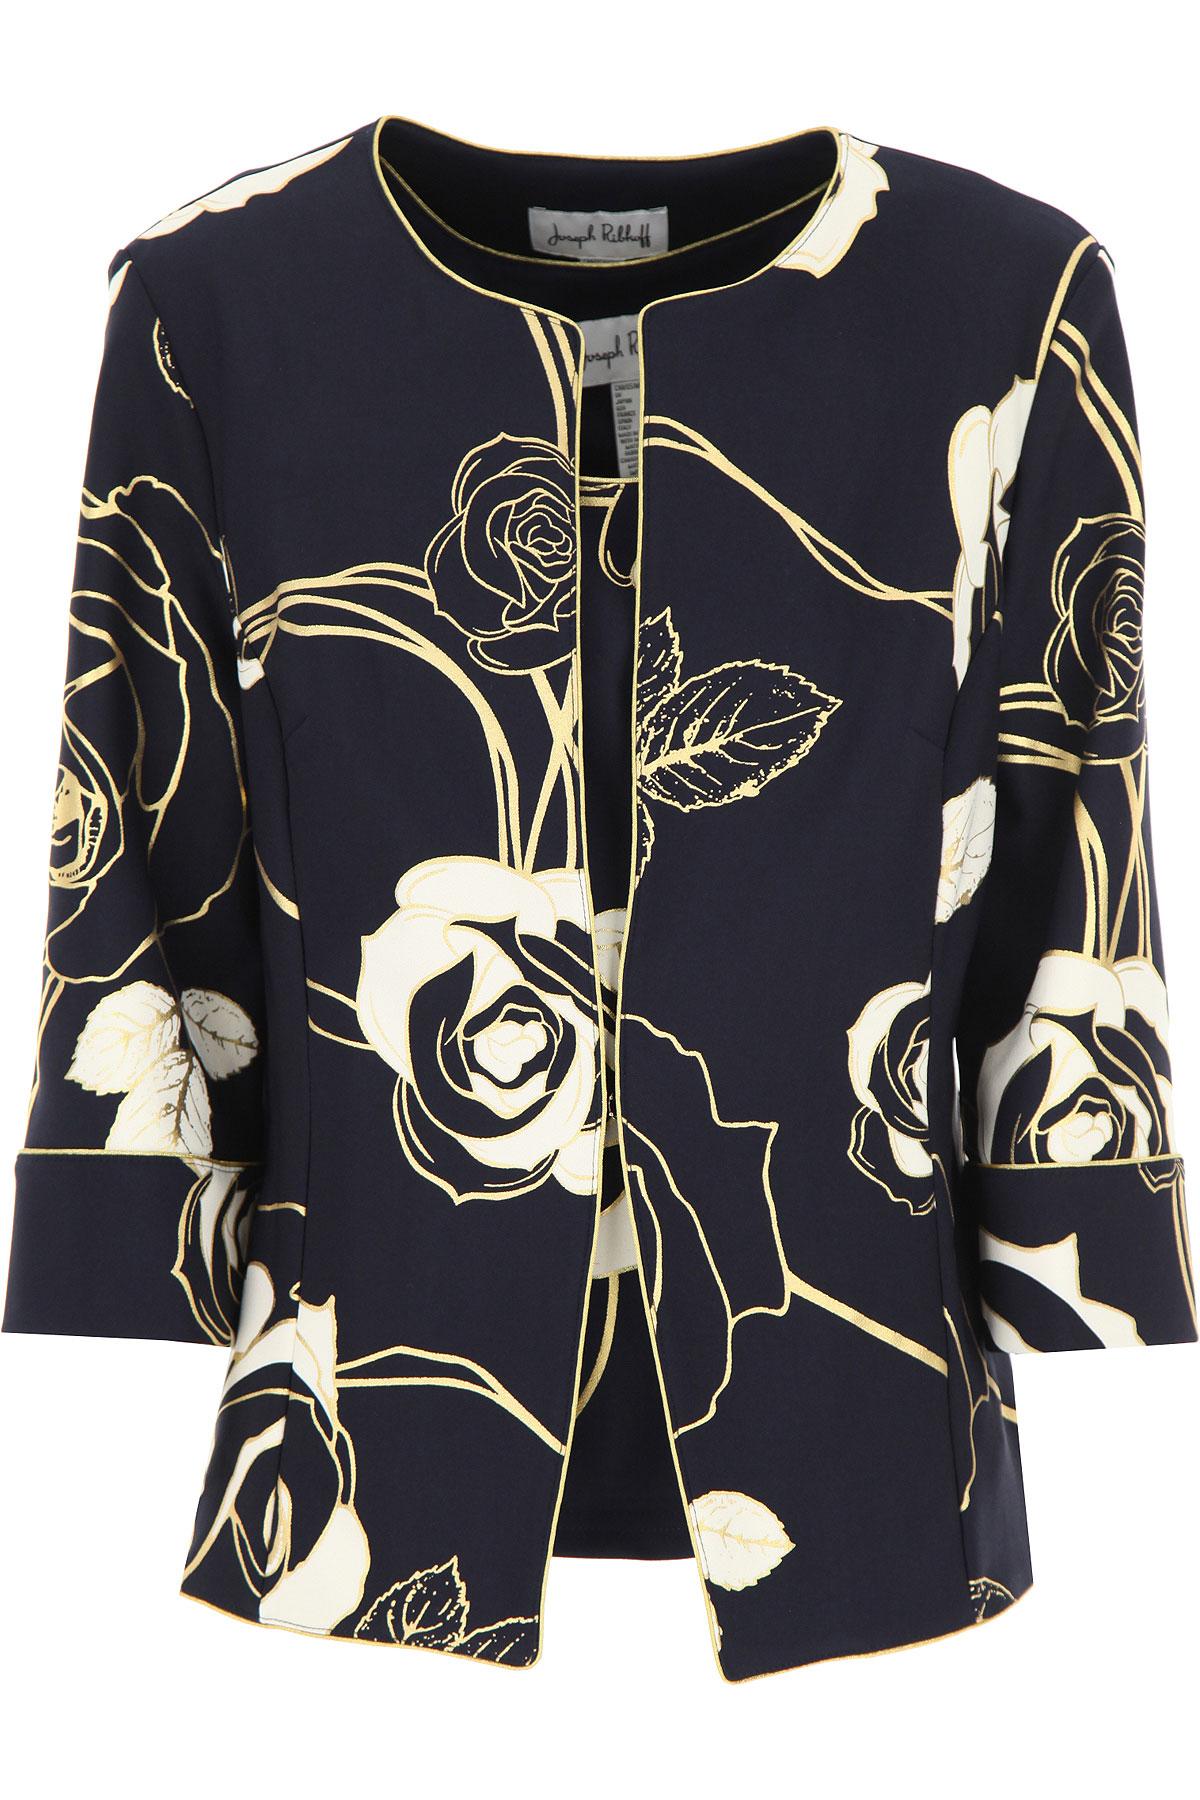 Joseph Ribkoff Jacket for Women On Sale, navy, polyester, 2019, 12 14